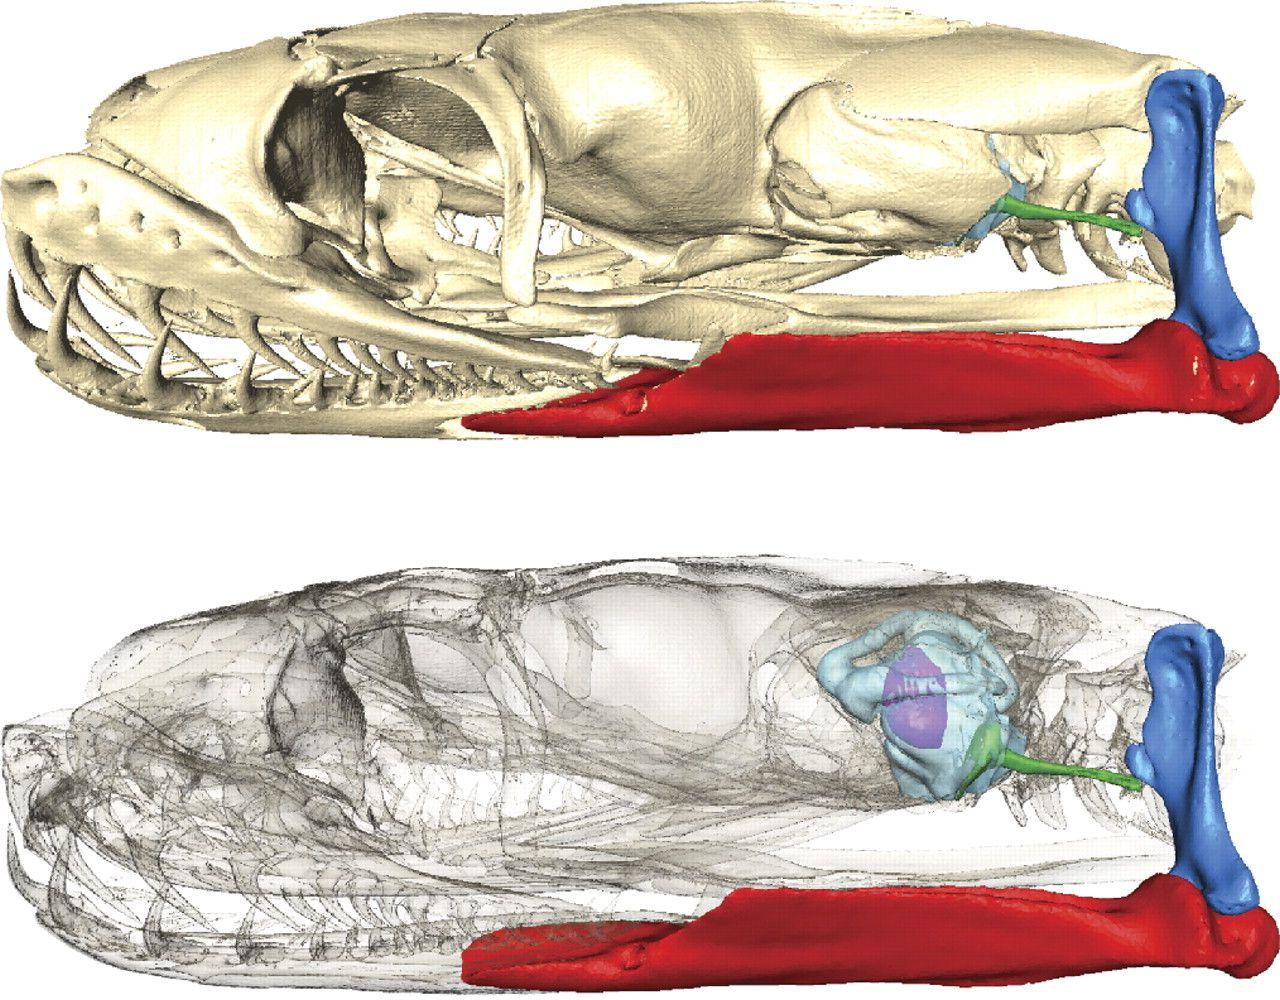 snake head anatomy - Google Search | snakes | Pinterest | Head ...